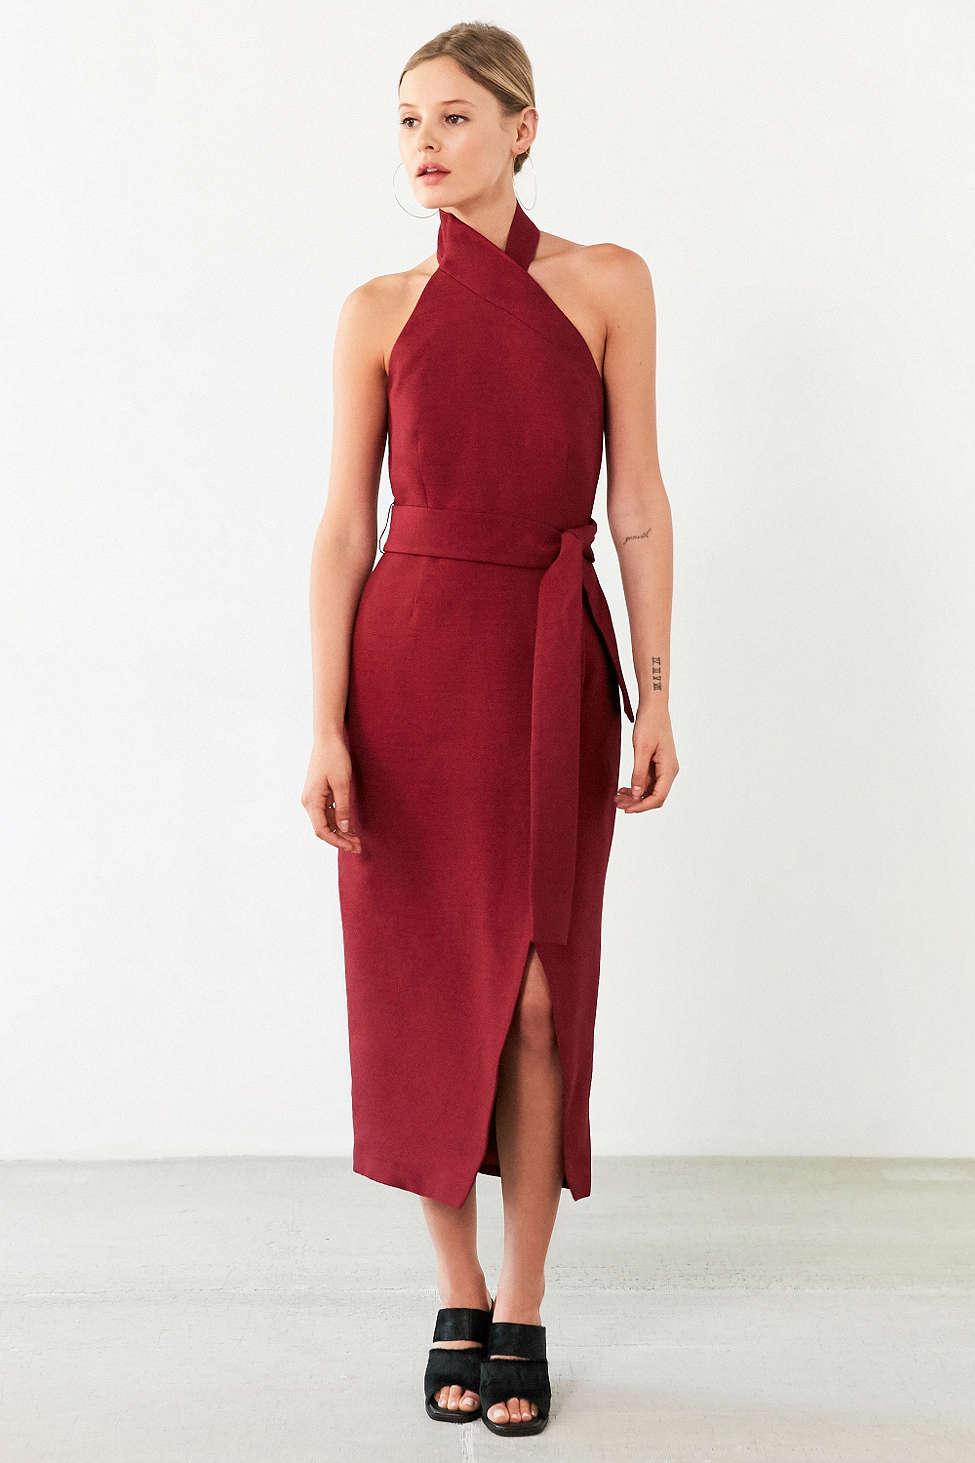 dee1b99c1cd7 20 Next-Level Bridesmaid Dresses Fashion Girls Can Get Behind ...